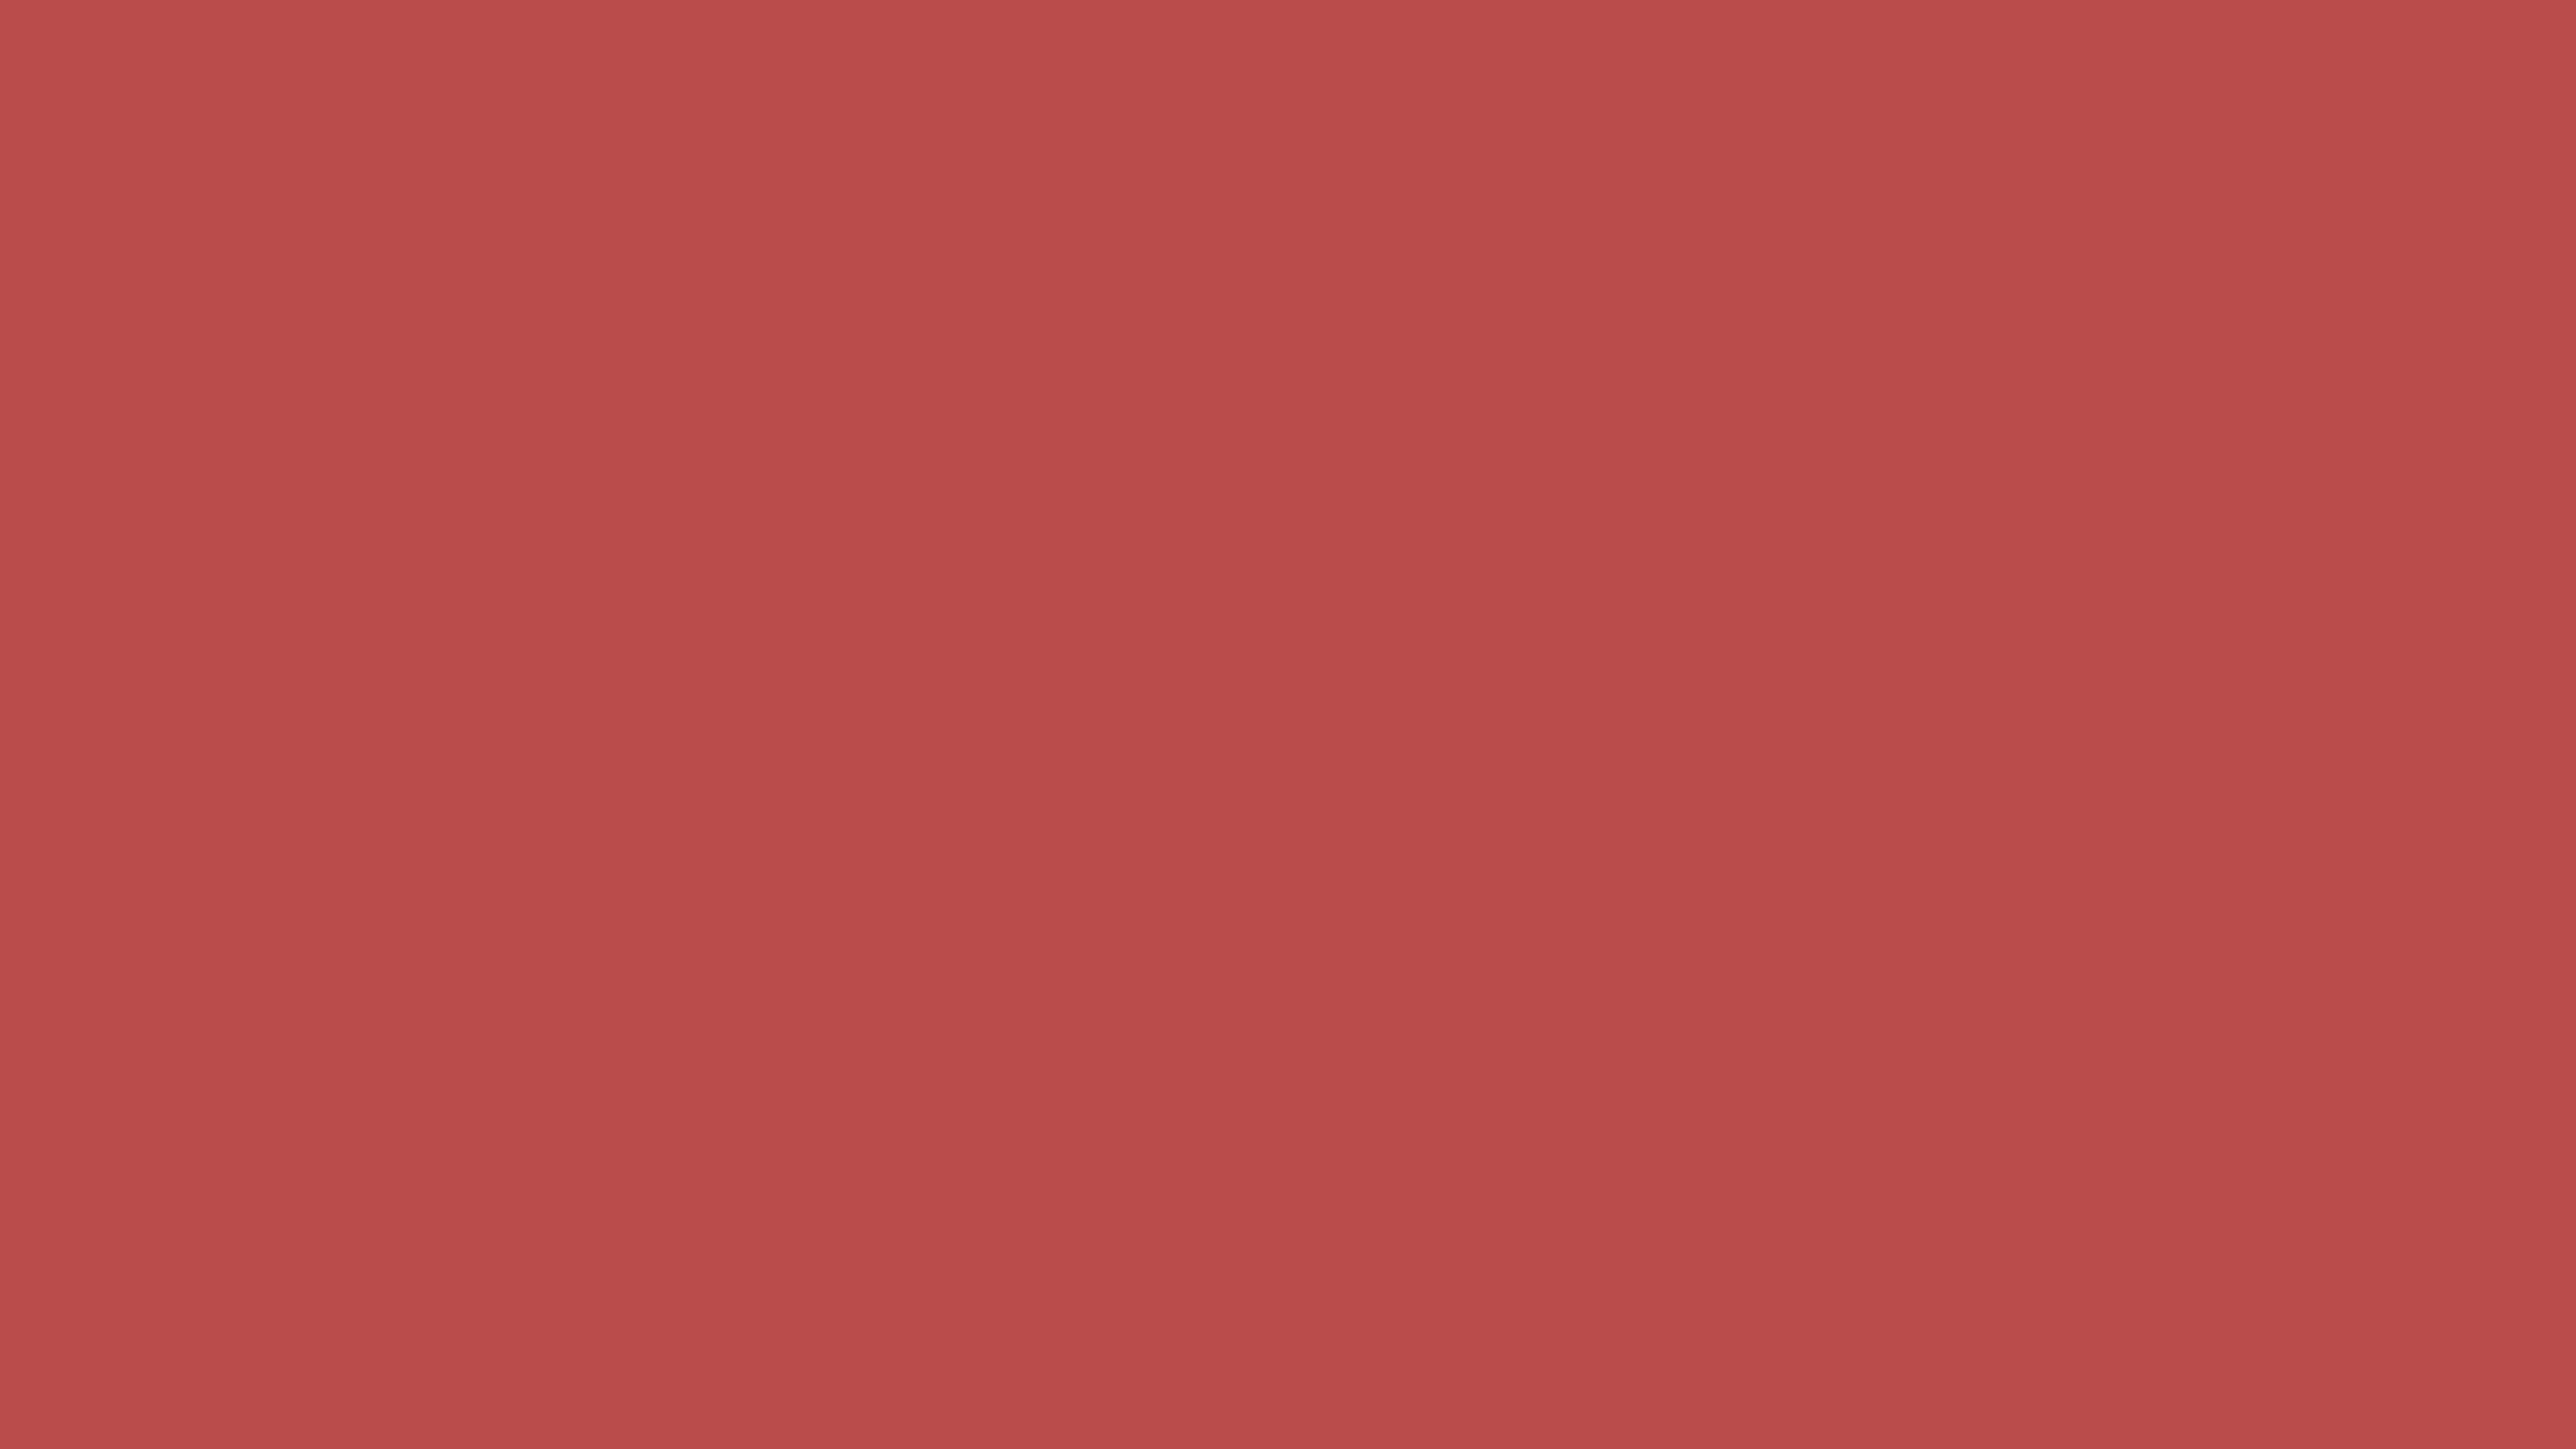 4096x2304 Deep Chestnut Solid Color Background